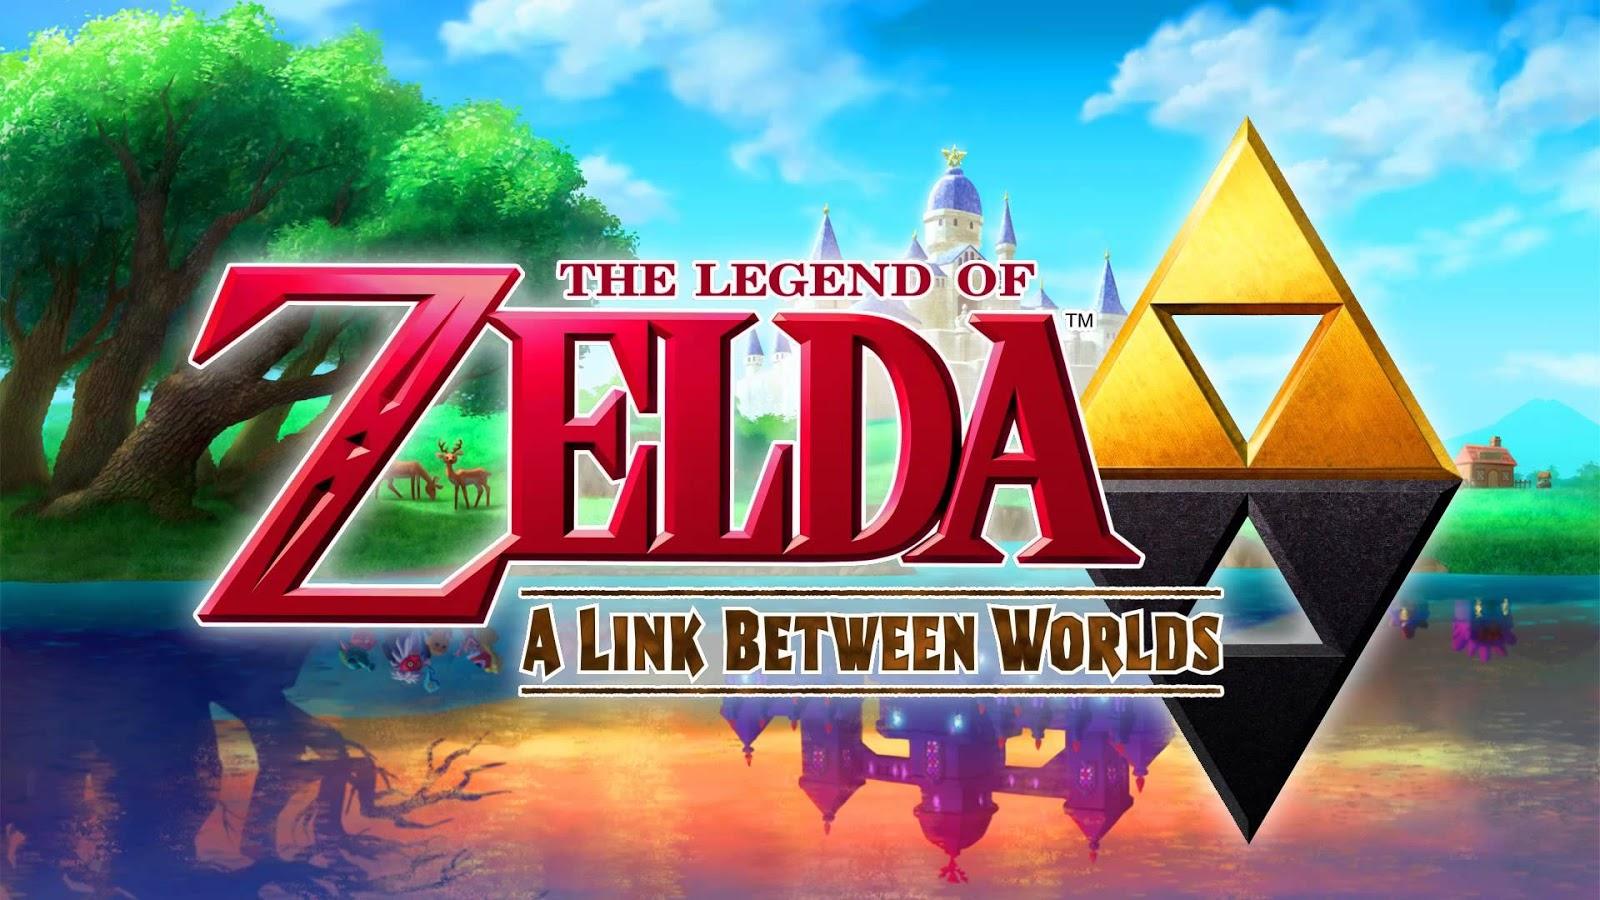 Midgar Channel 8 Riding The Zelda Wave A Link Between Worlds